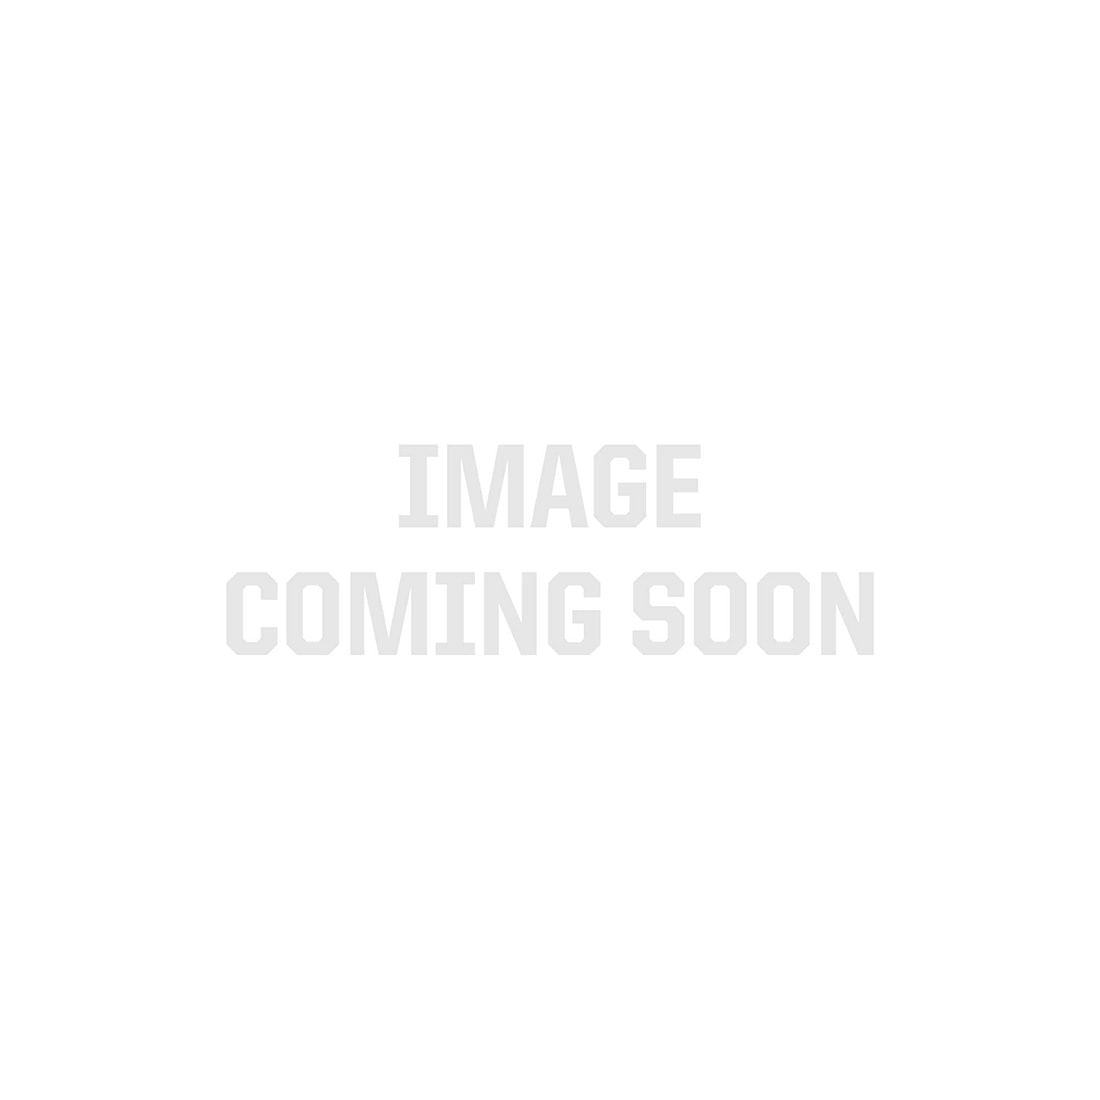 Wall Mount RGB LED Controller Pro (Rotary Knob - White, US Size)